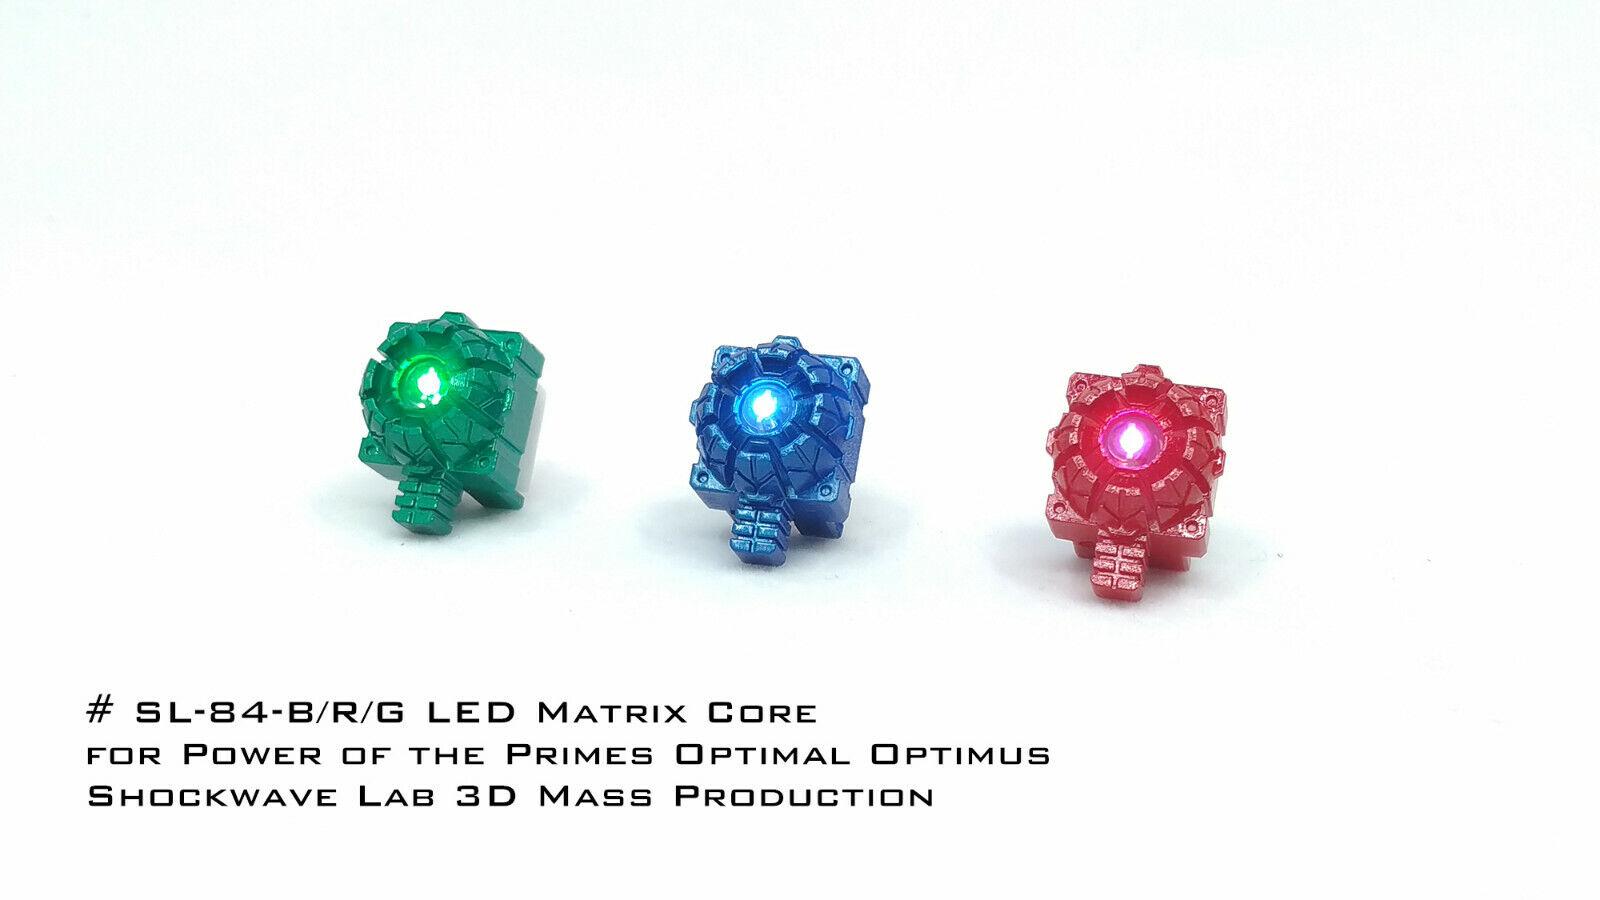 Led Upgrade Kit For Power Of The Primes POTP Leader Evolution Optimal Optimus